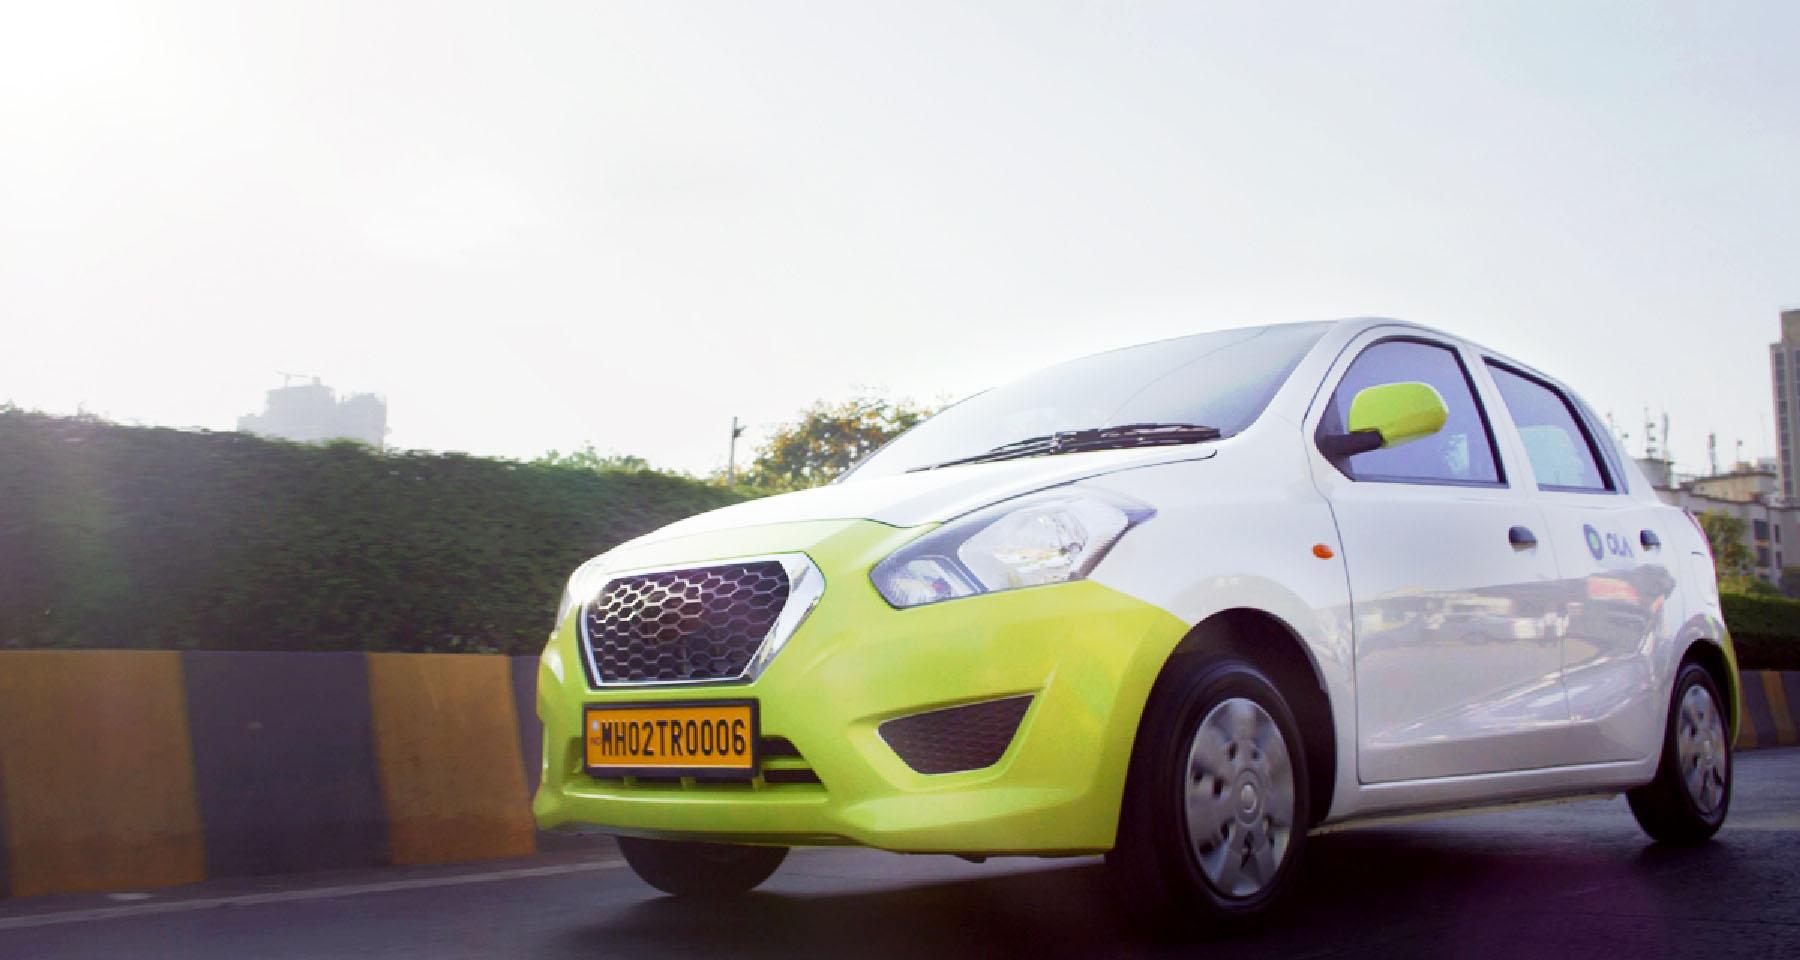 Book Chennai To Vellore Cabs Online At 2675 Chennai Vellore Cab